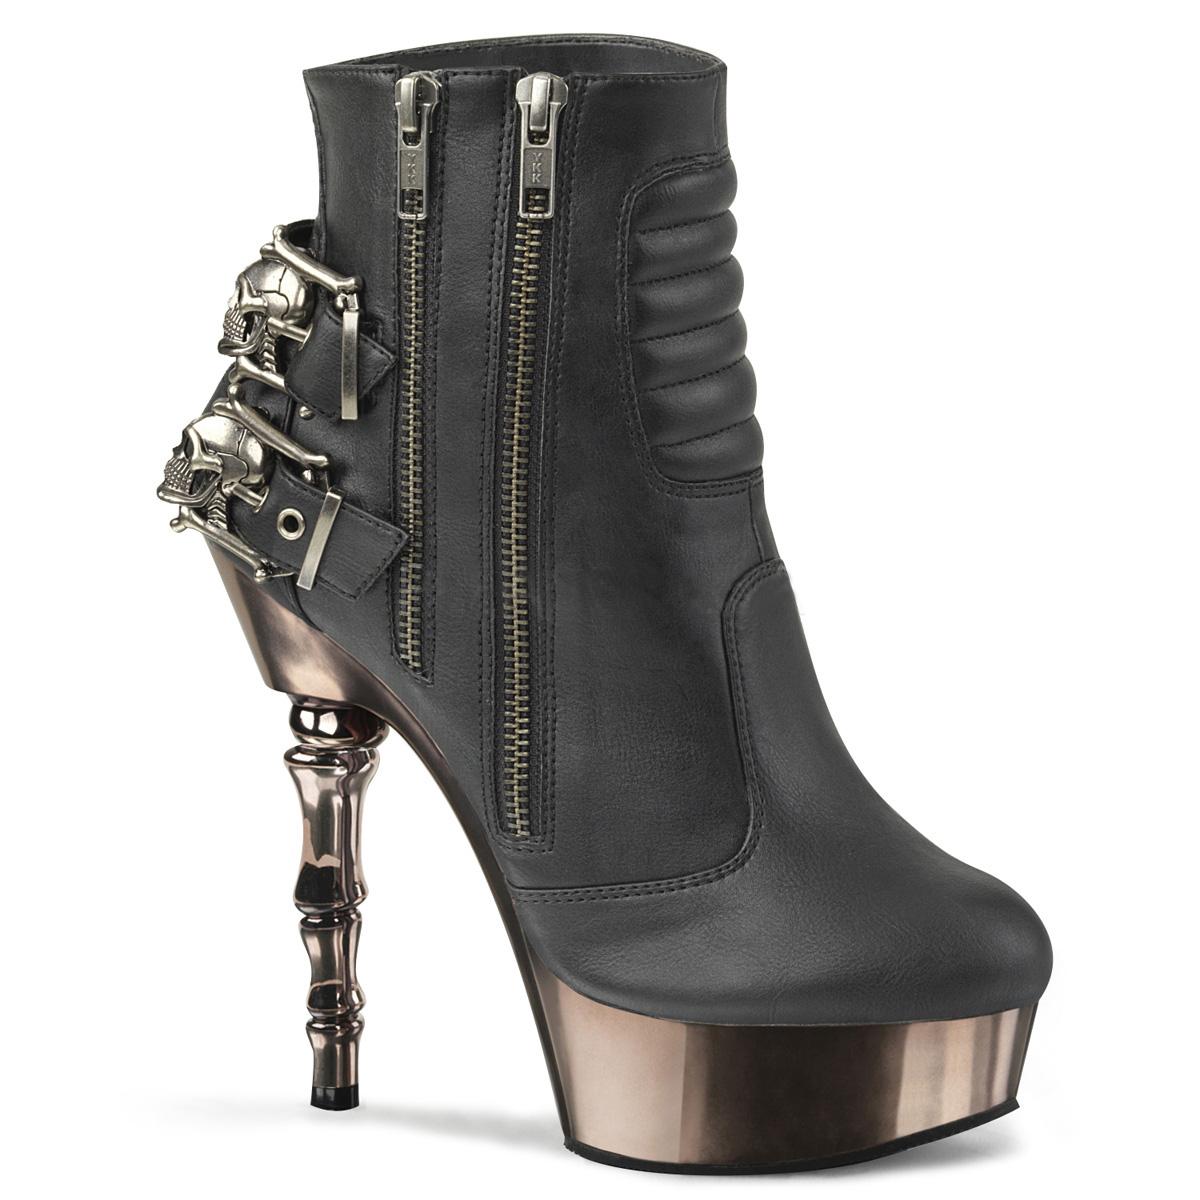 "High Heels Pleaser Shoes Damenschuhe Demonia /""MUERTO-1030/"""